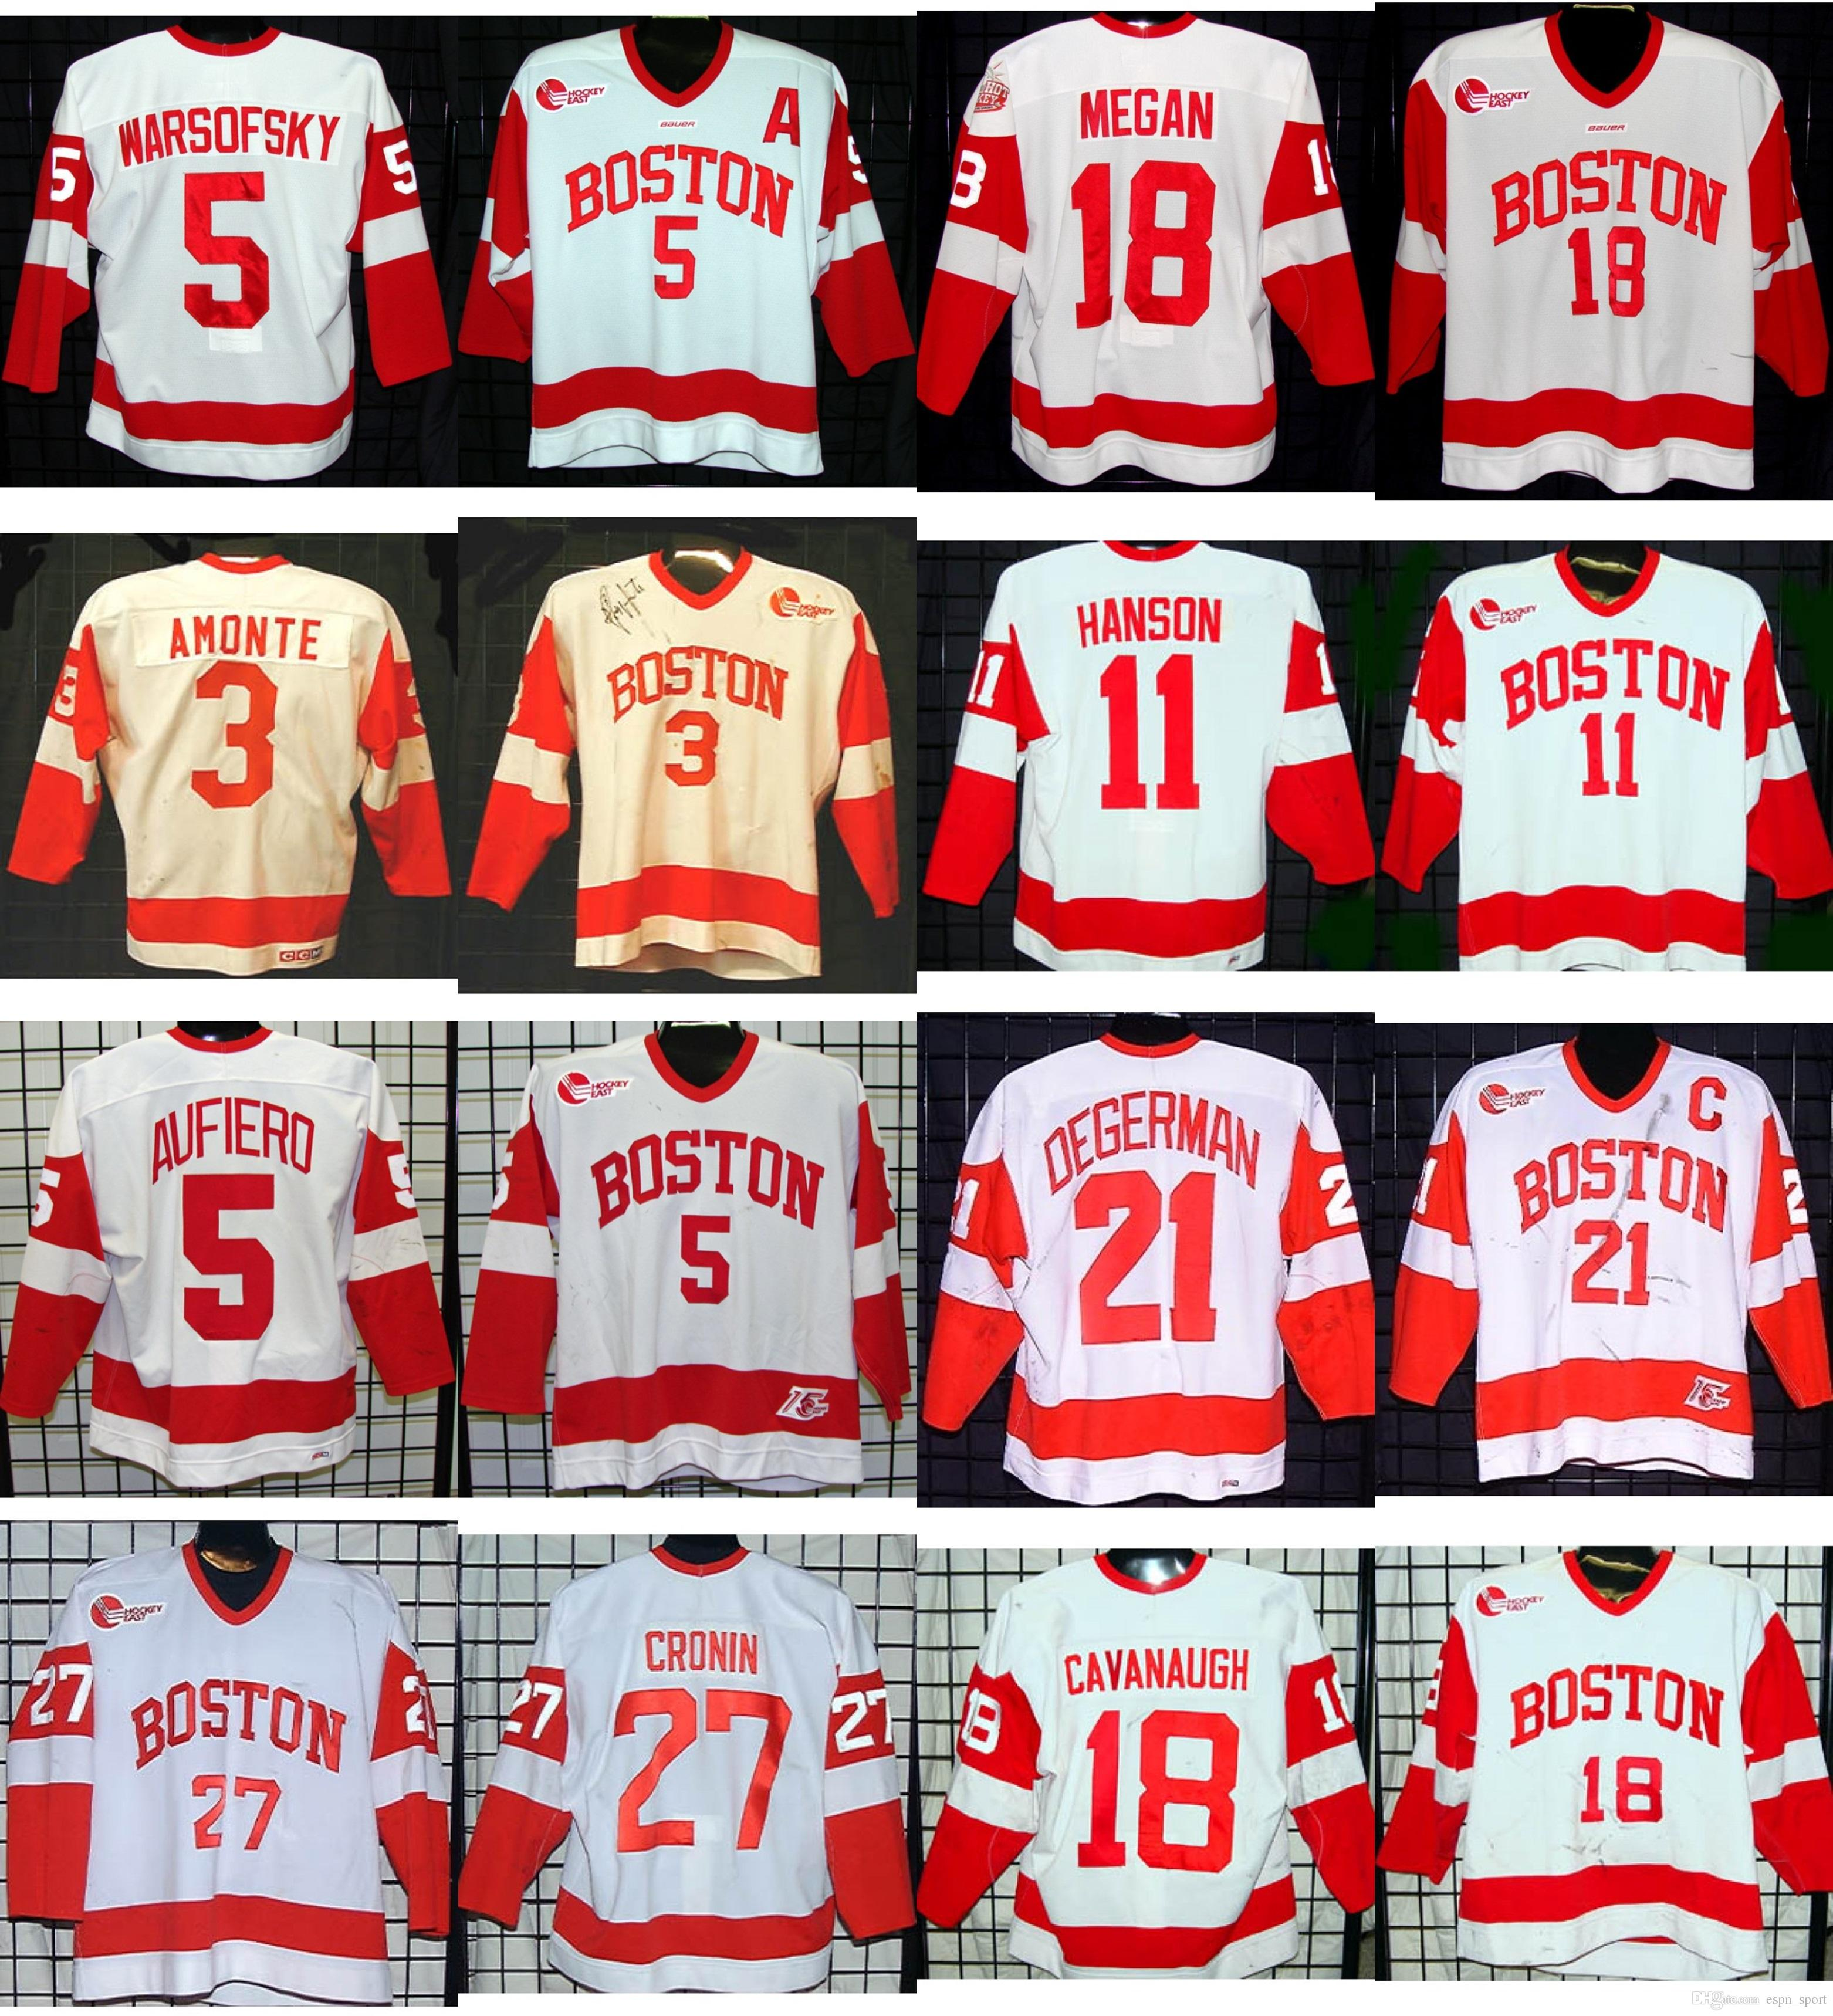 NCAA Boston Terriers Mens 3 Tony Amote 27 John Cronin 11 Hanson 5 Patrick  Aufiero 18 Cavanaugh 21 Tommi Degerman Hockey Cheap Jerseys 5 David  Warsofsky ... 7b3eb2356c50